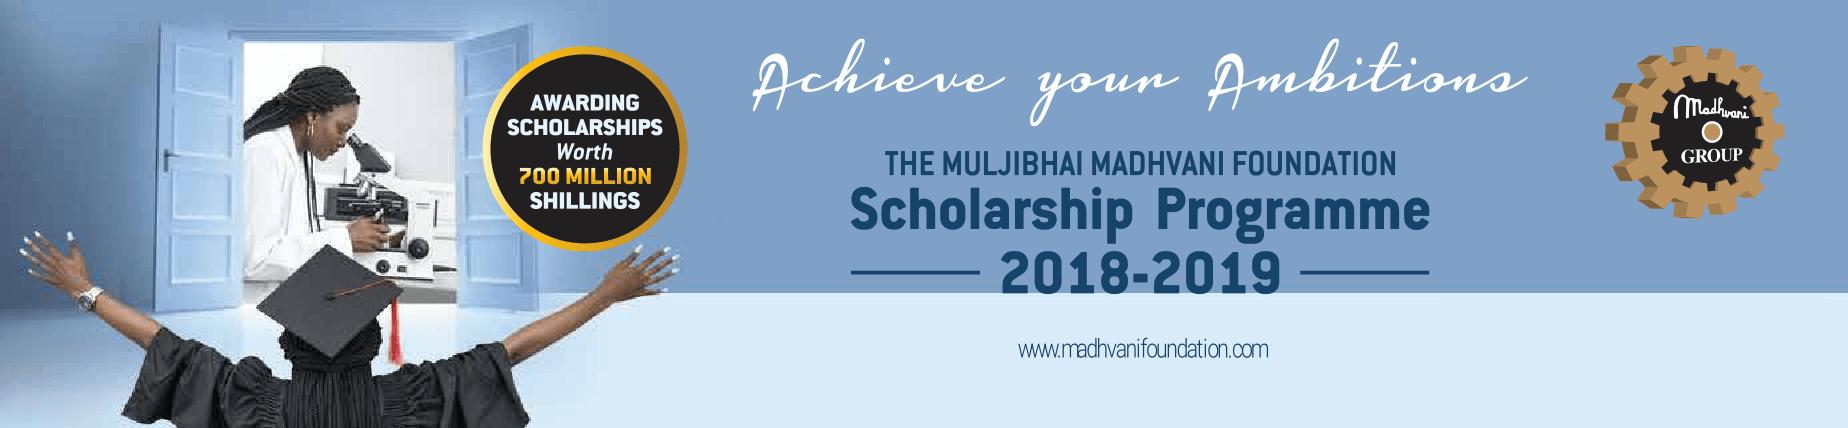 Madhvani Foundation Scholarship Programme 2018/2019